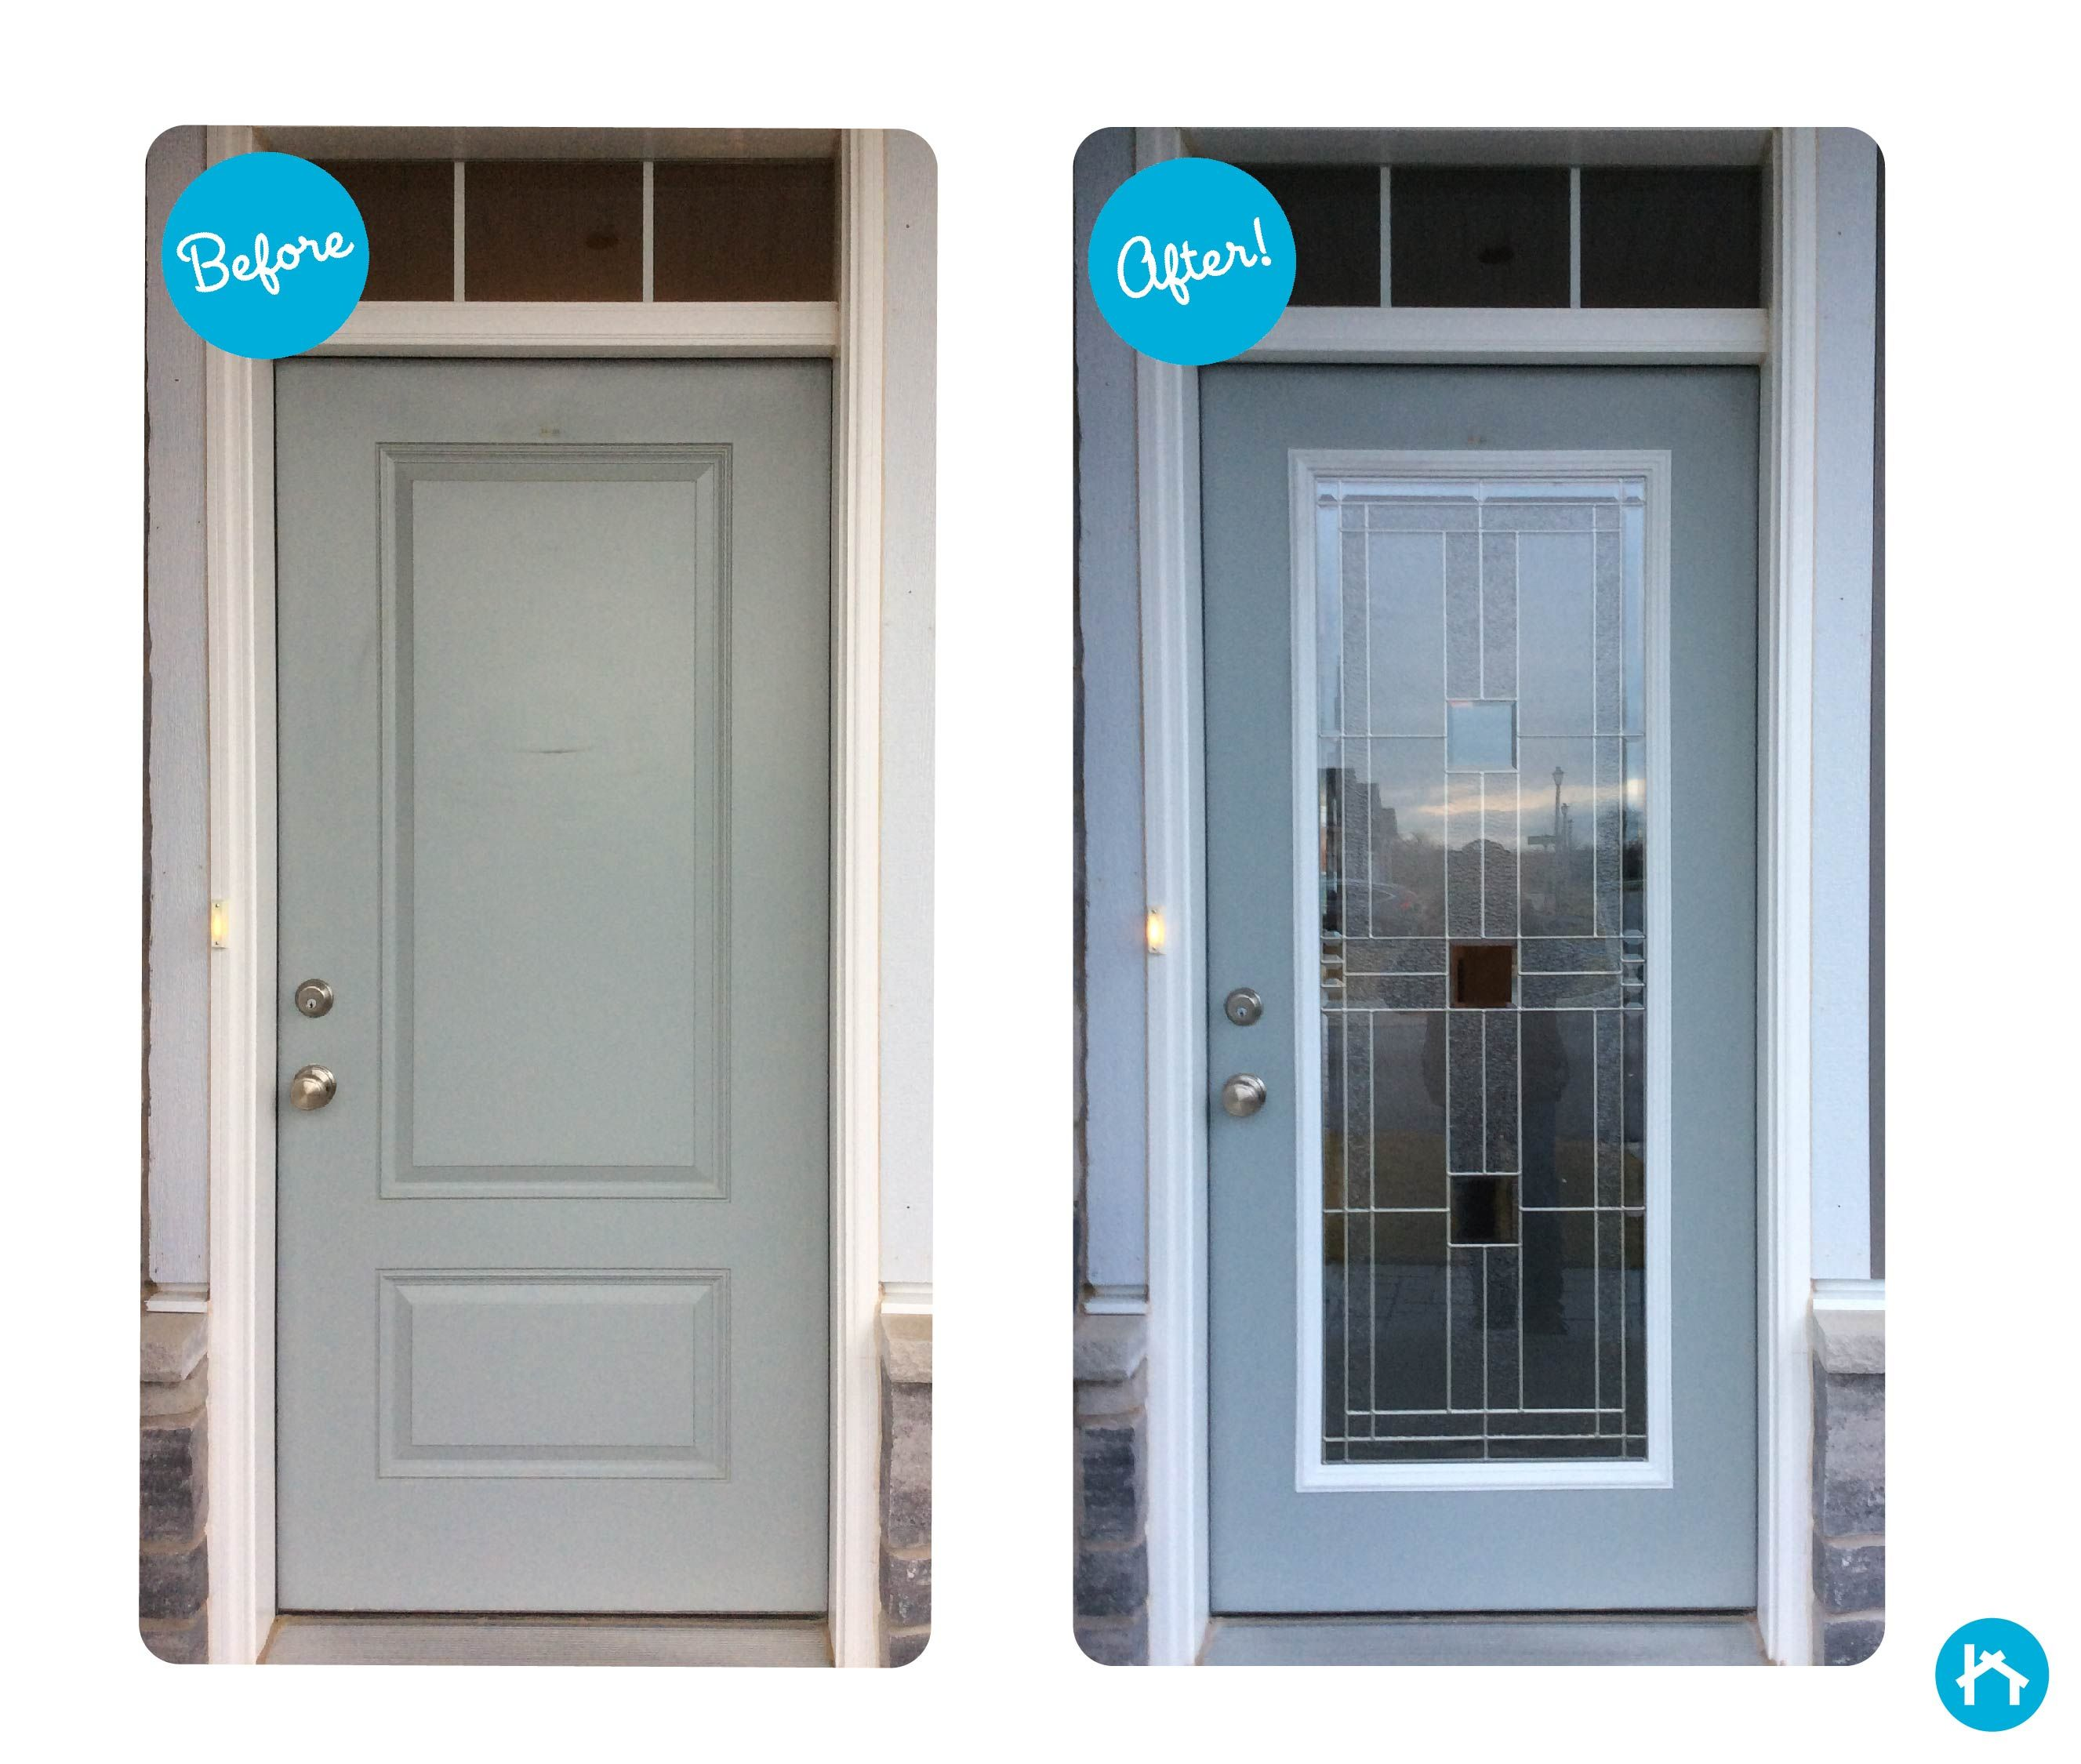 Update Your Door In Less Than An Hour With Decorative Door Glass